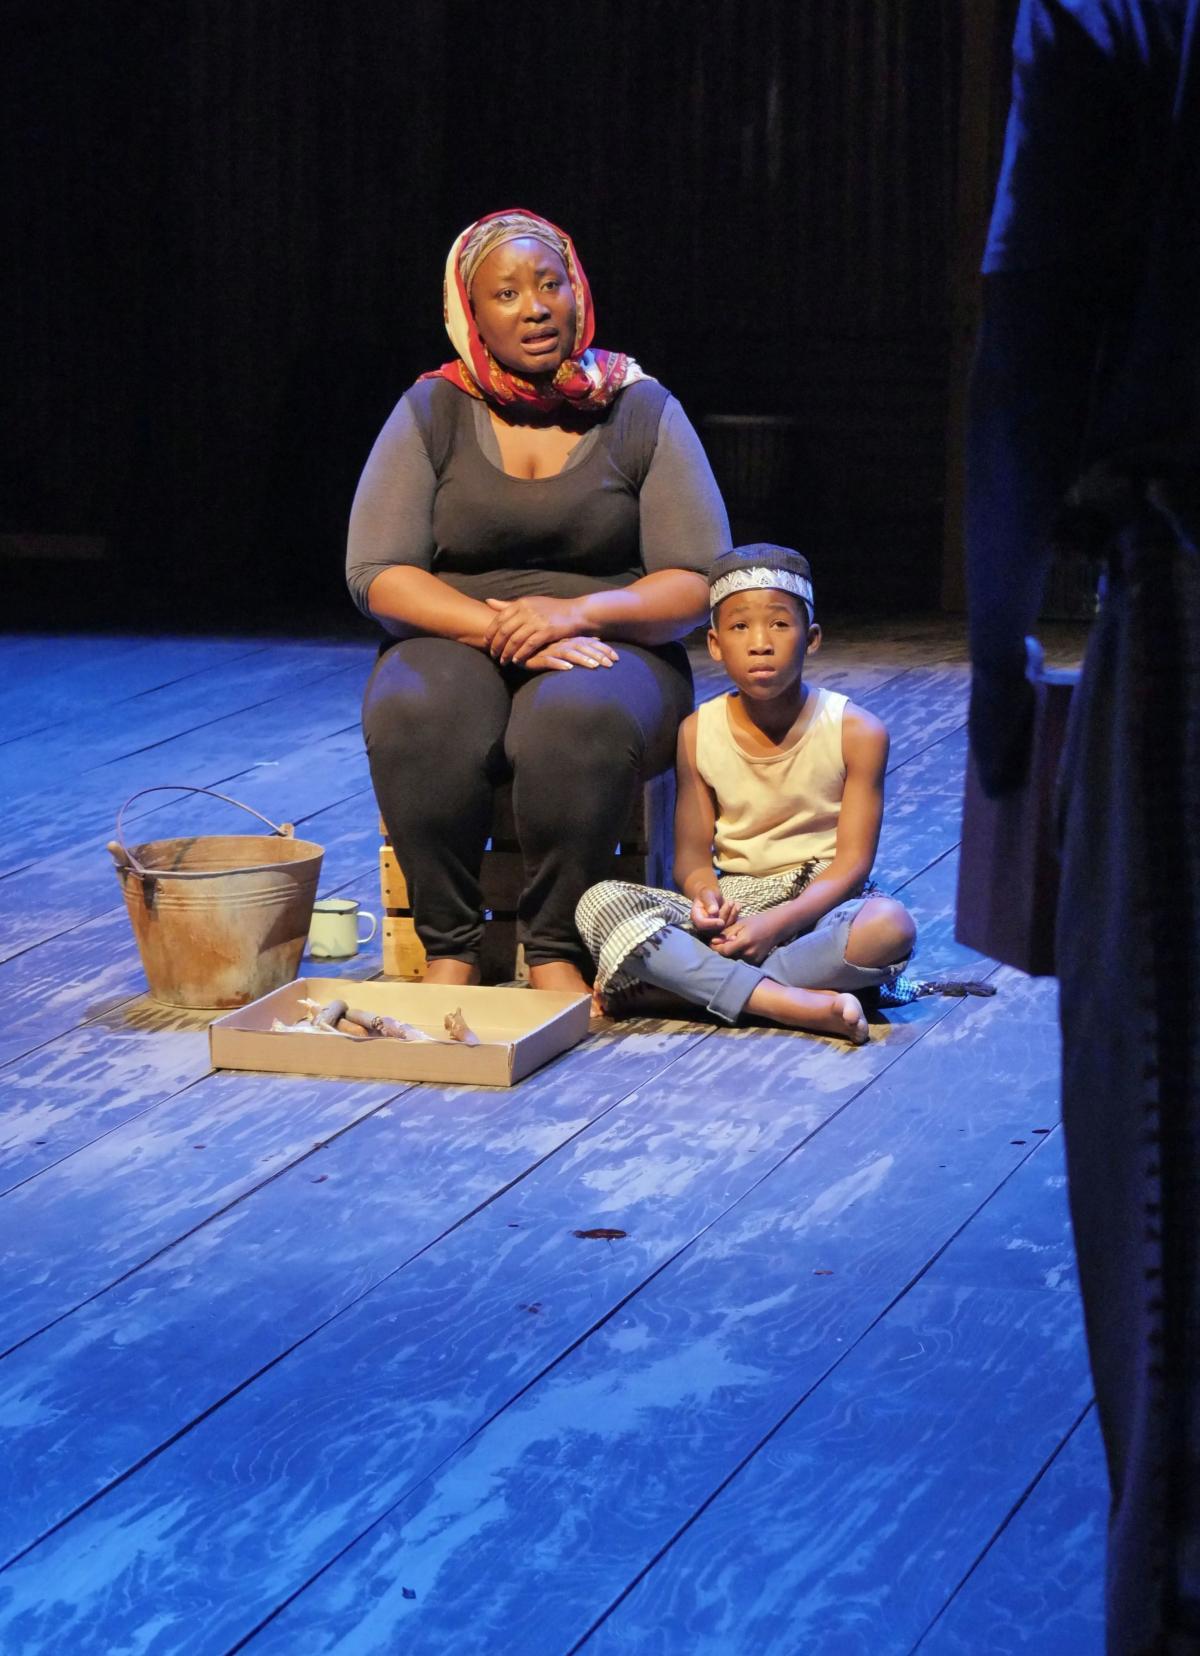 Pauline Malefane appears alongside Siphosethu Juta in A Man of Good Hope.